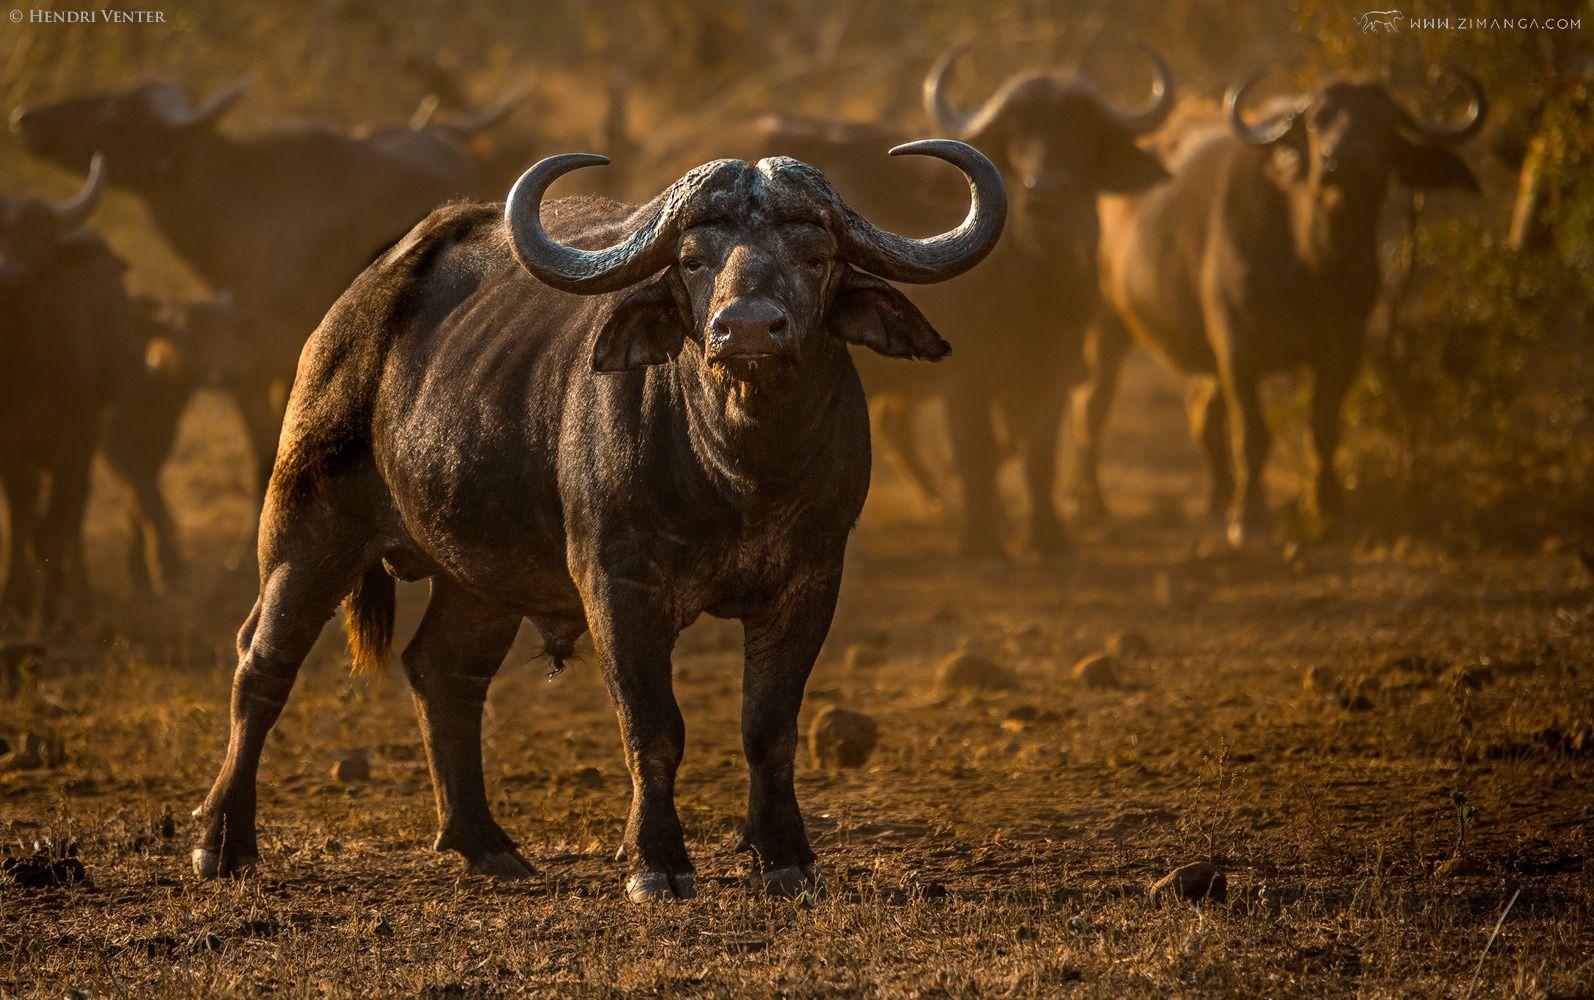 Photo Cape Buffalo by Hendri Venter on 500px